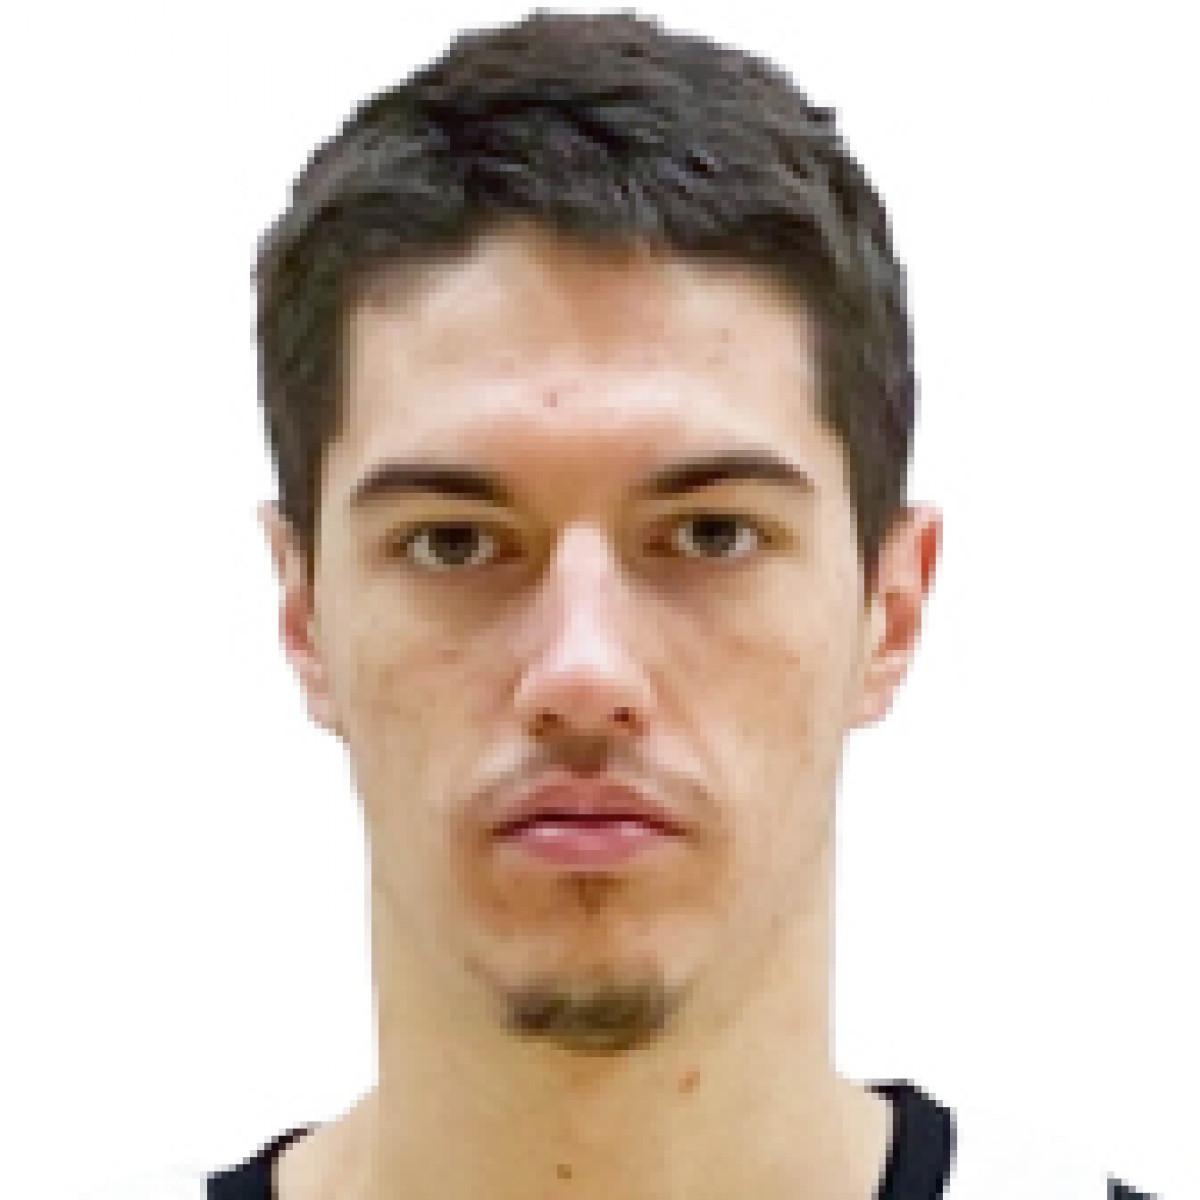 Stefan Mitrovic